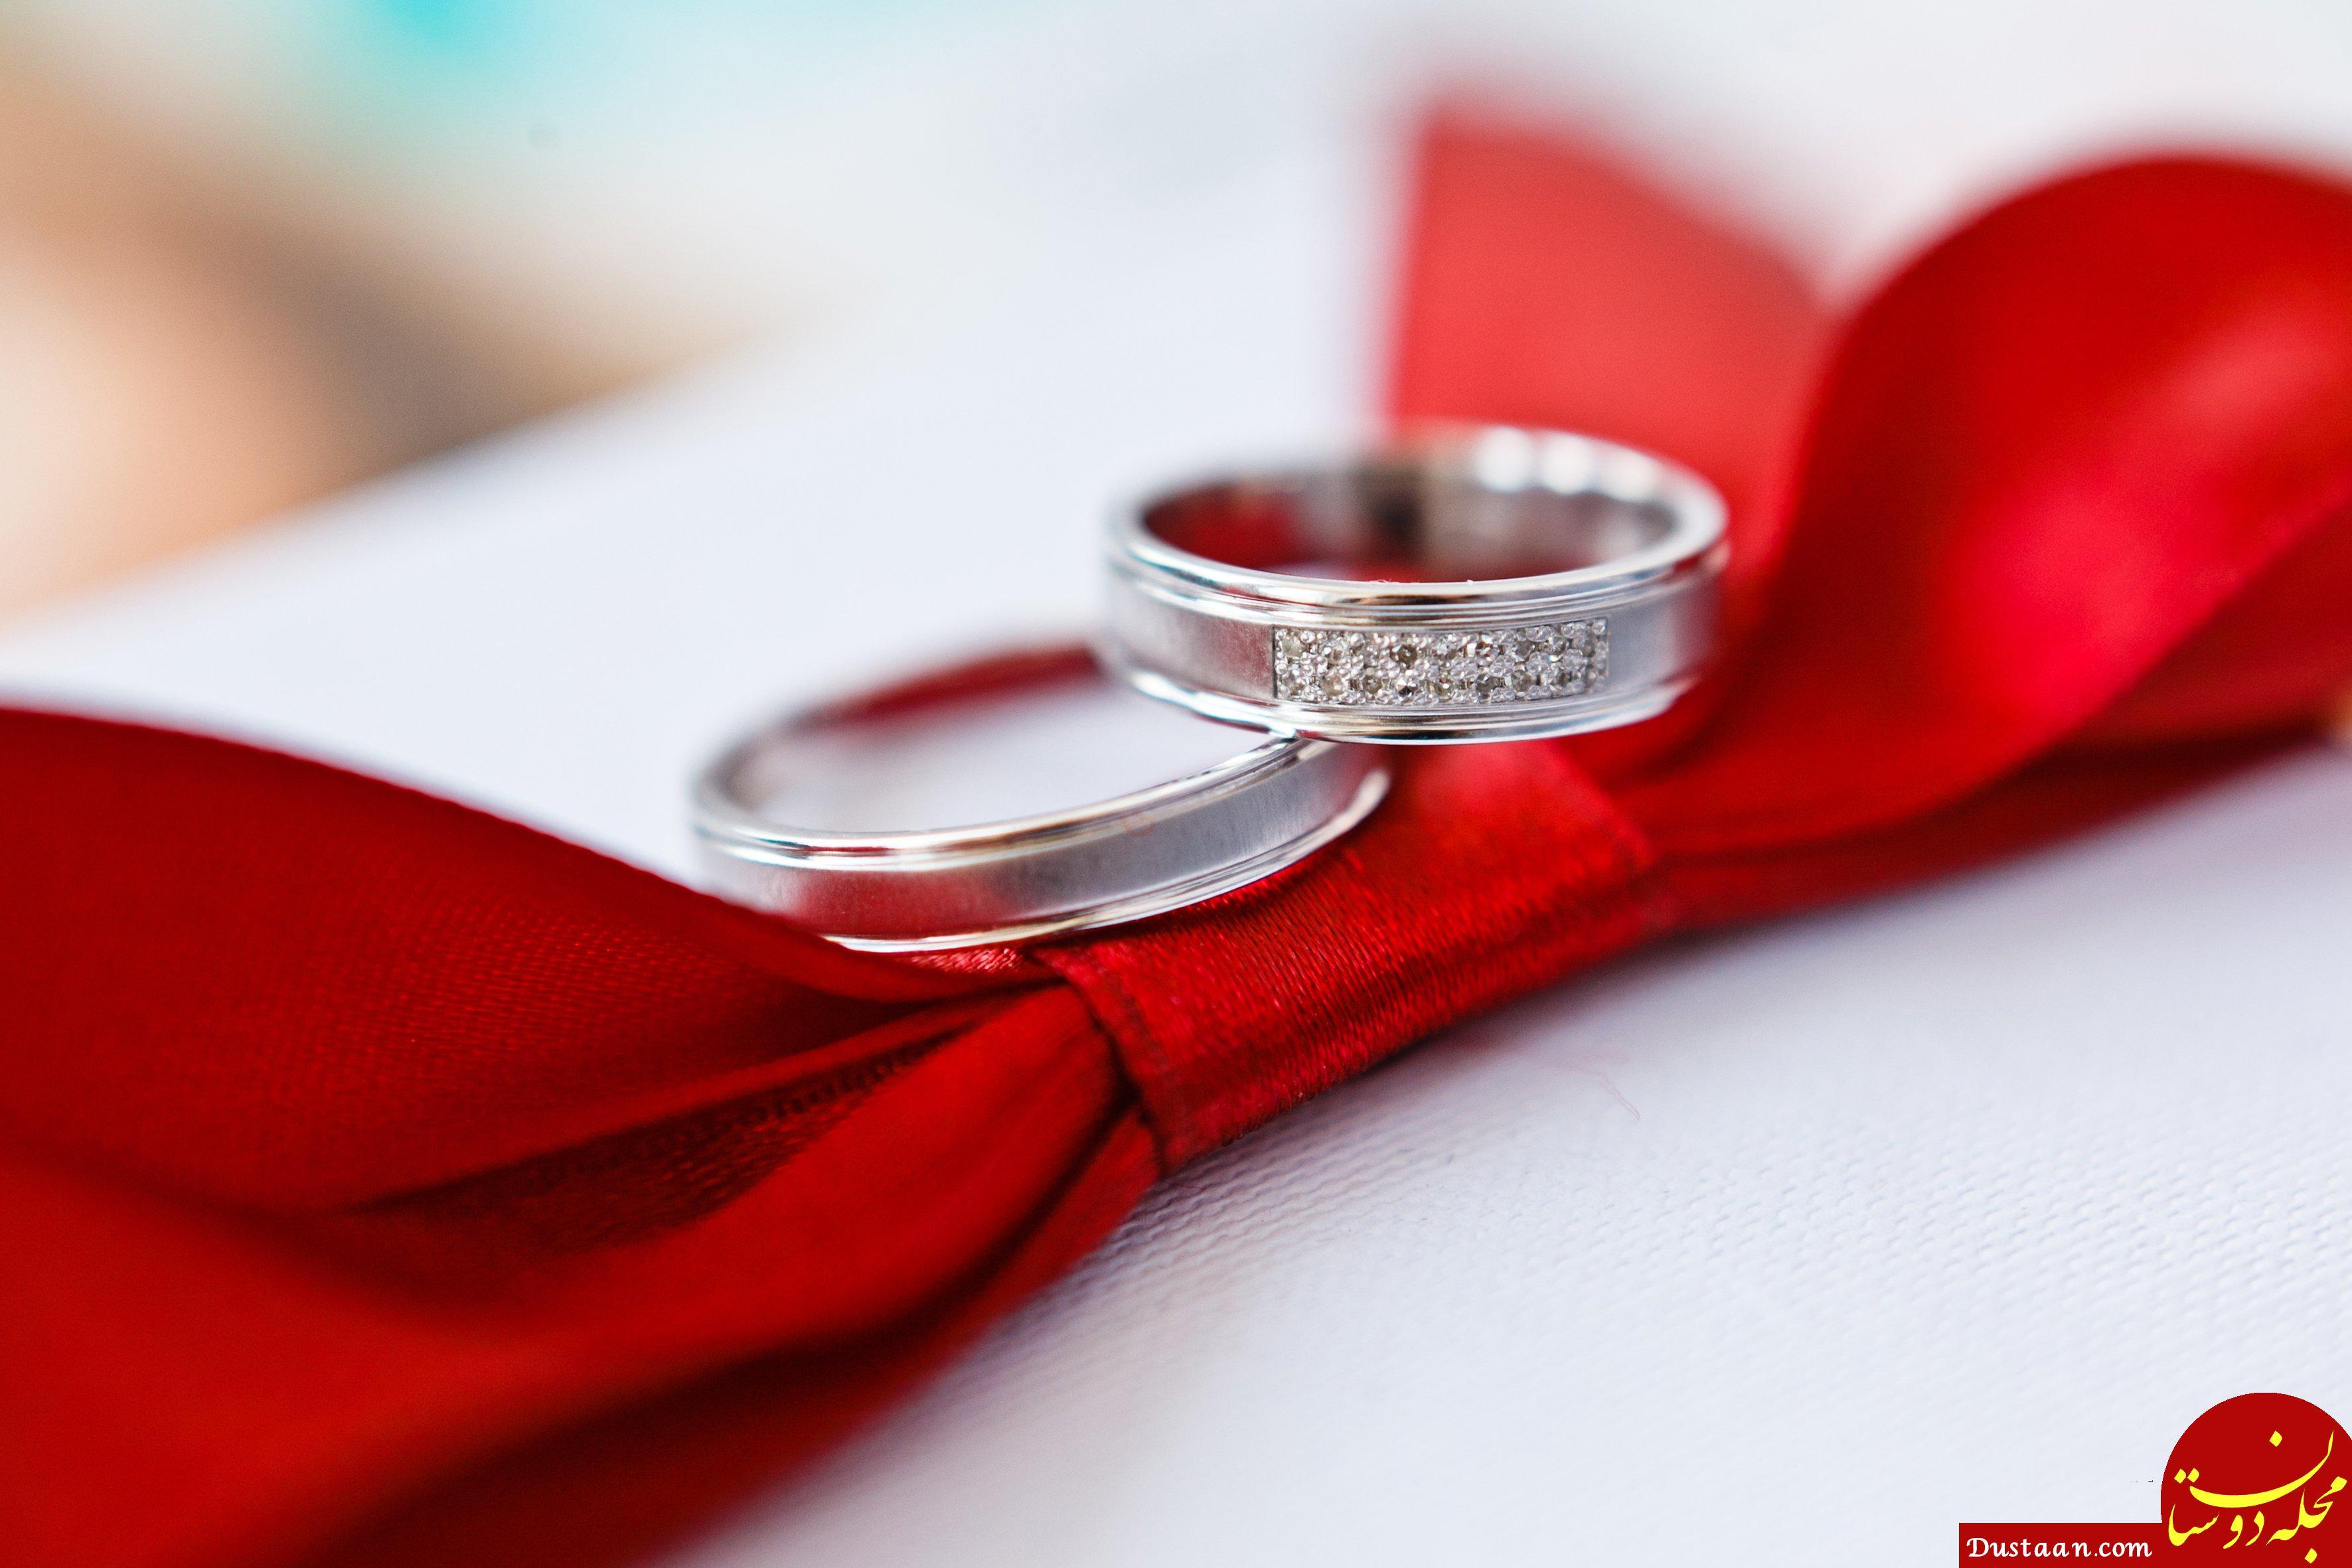 www.dustaan.com اختلاف اعتقادی چقدر در ازدواج مهمه؟